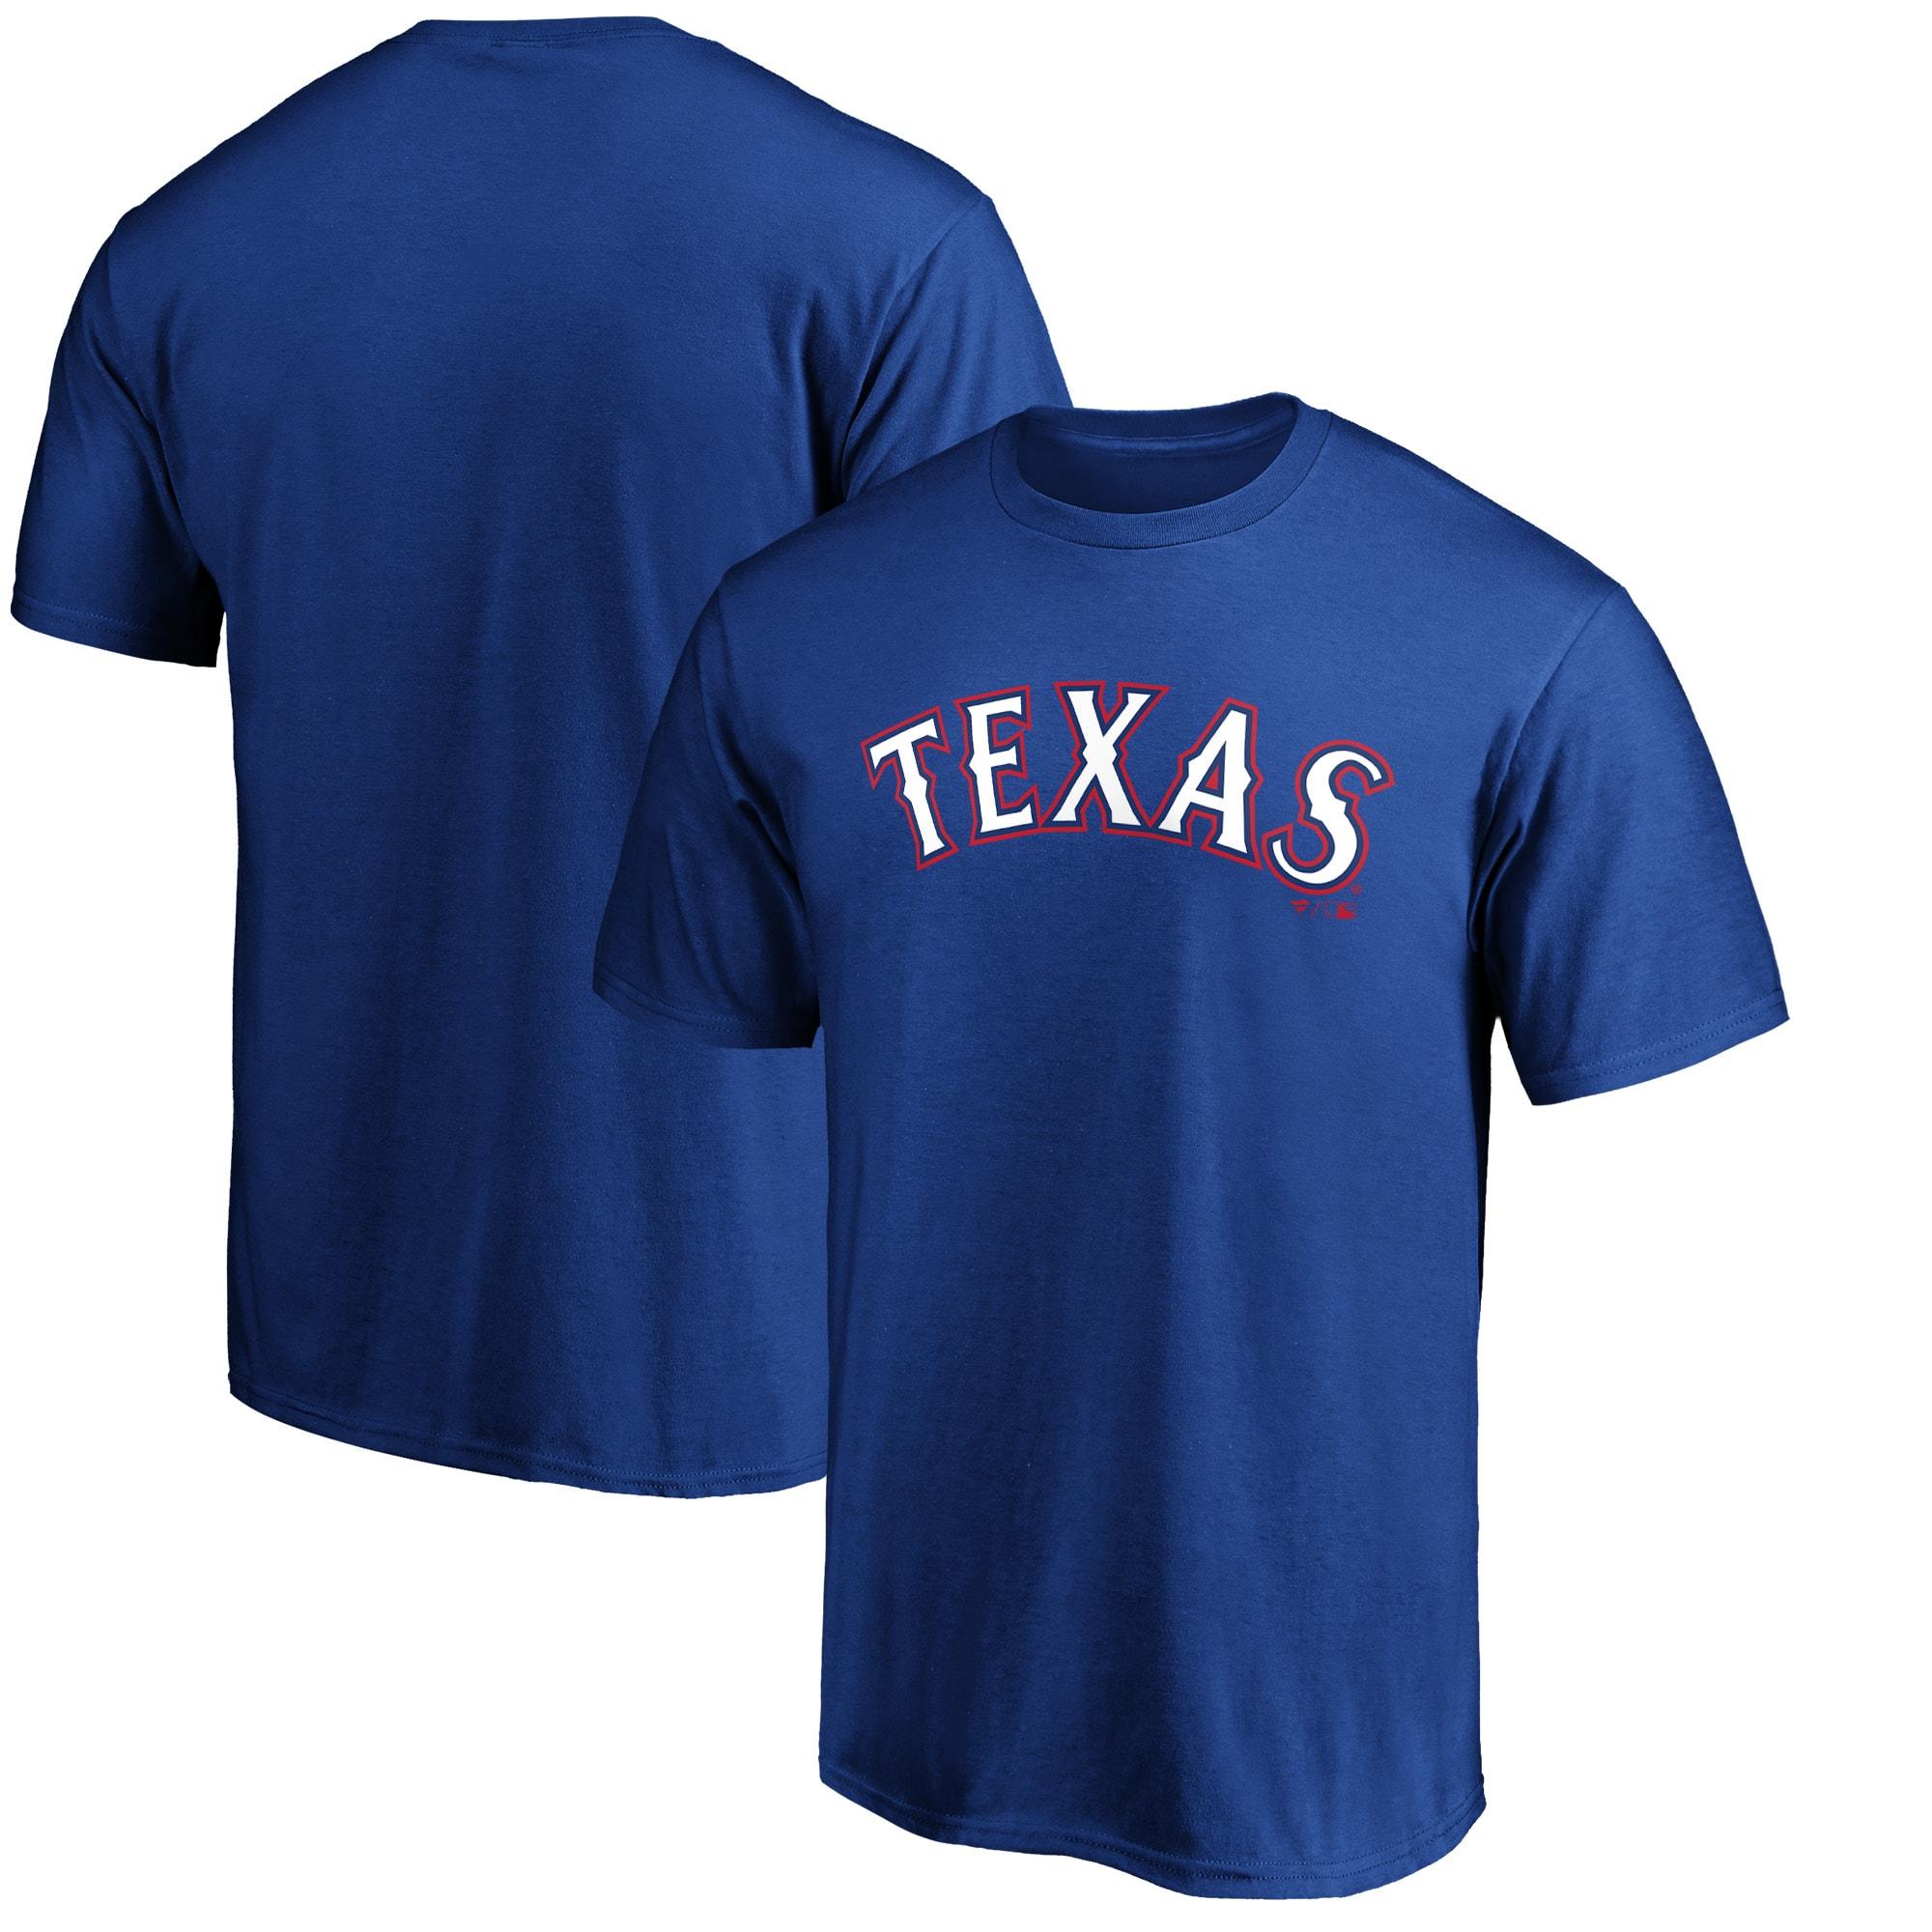 Texas Rangers Fanatics Branded Official Wordmark T-Shirt - Royal